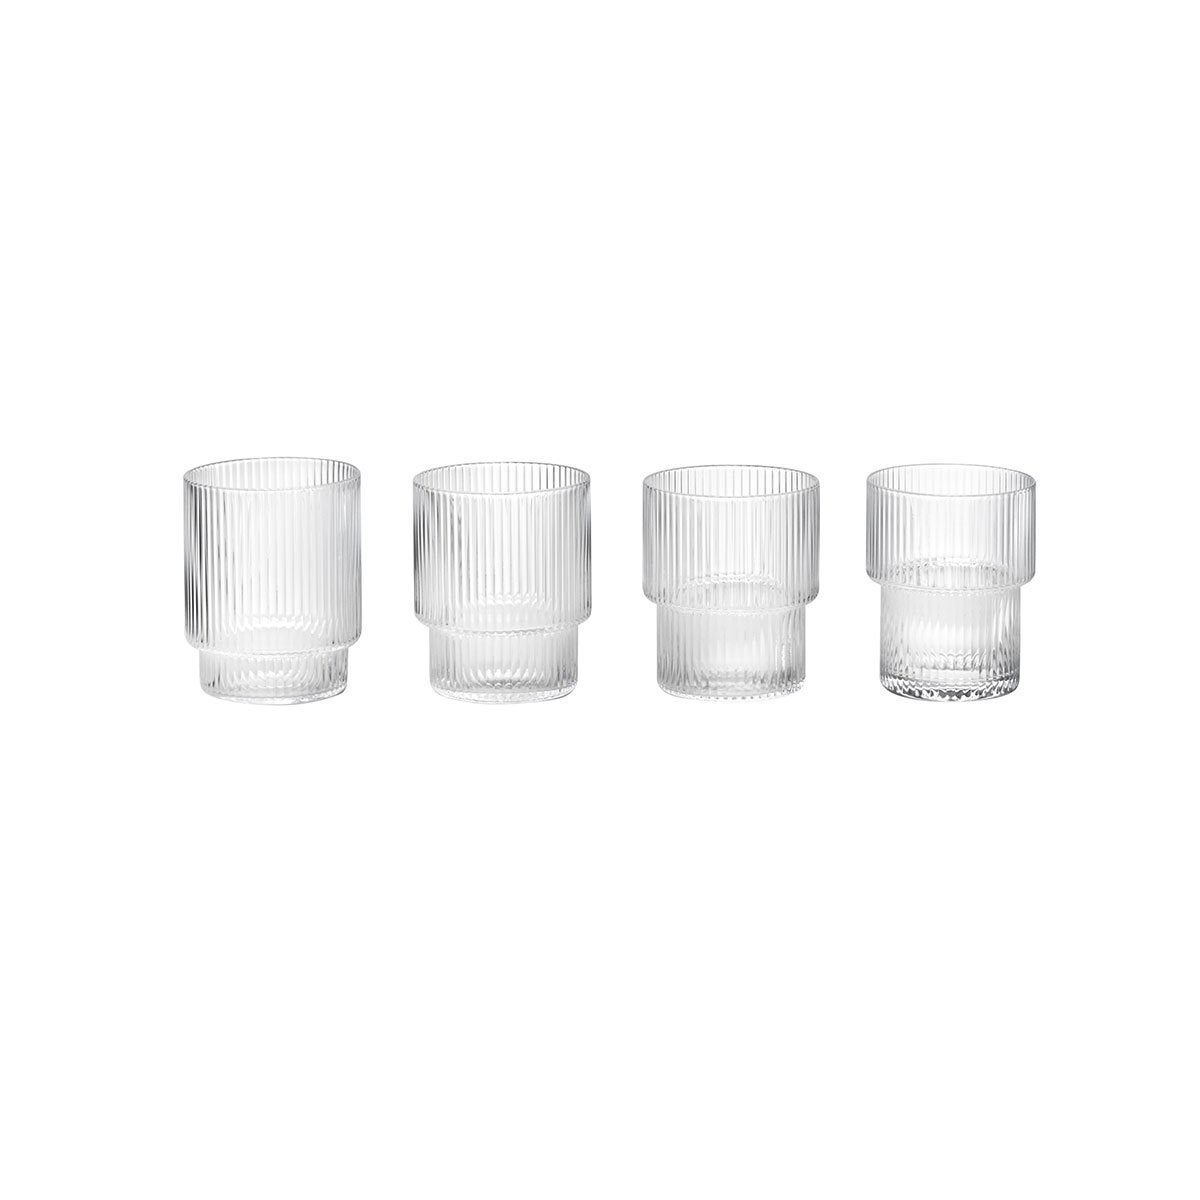 Ferm_Living-Ripple_Glasses-Product-TRNK-1200×1200-2